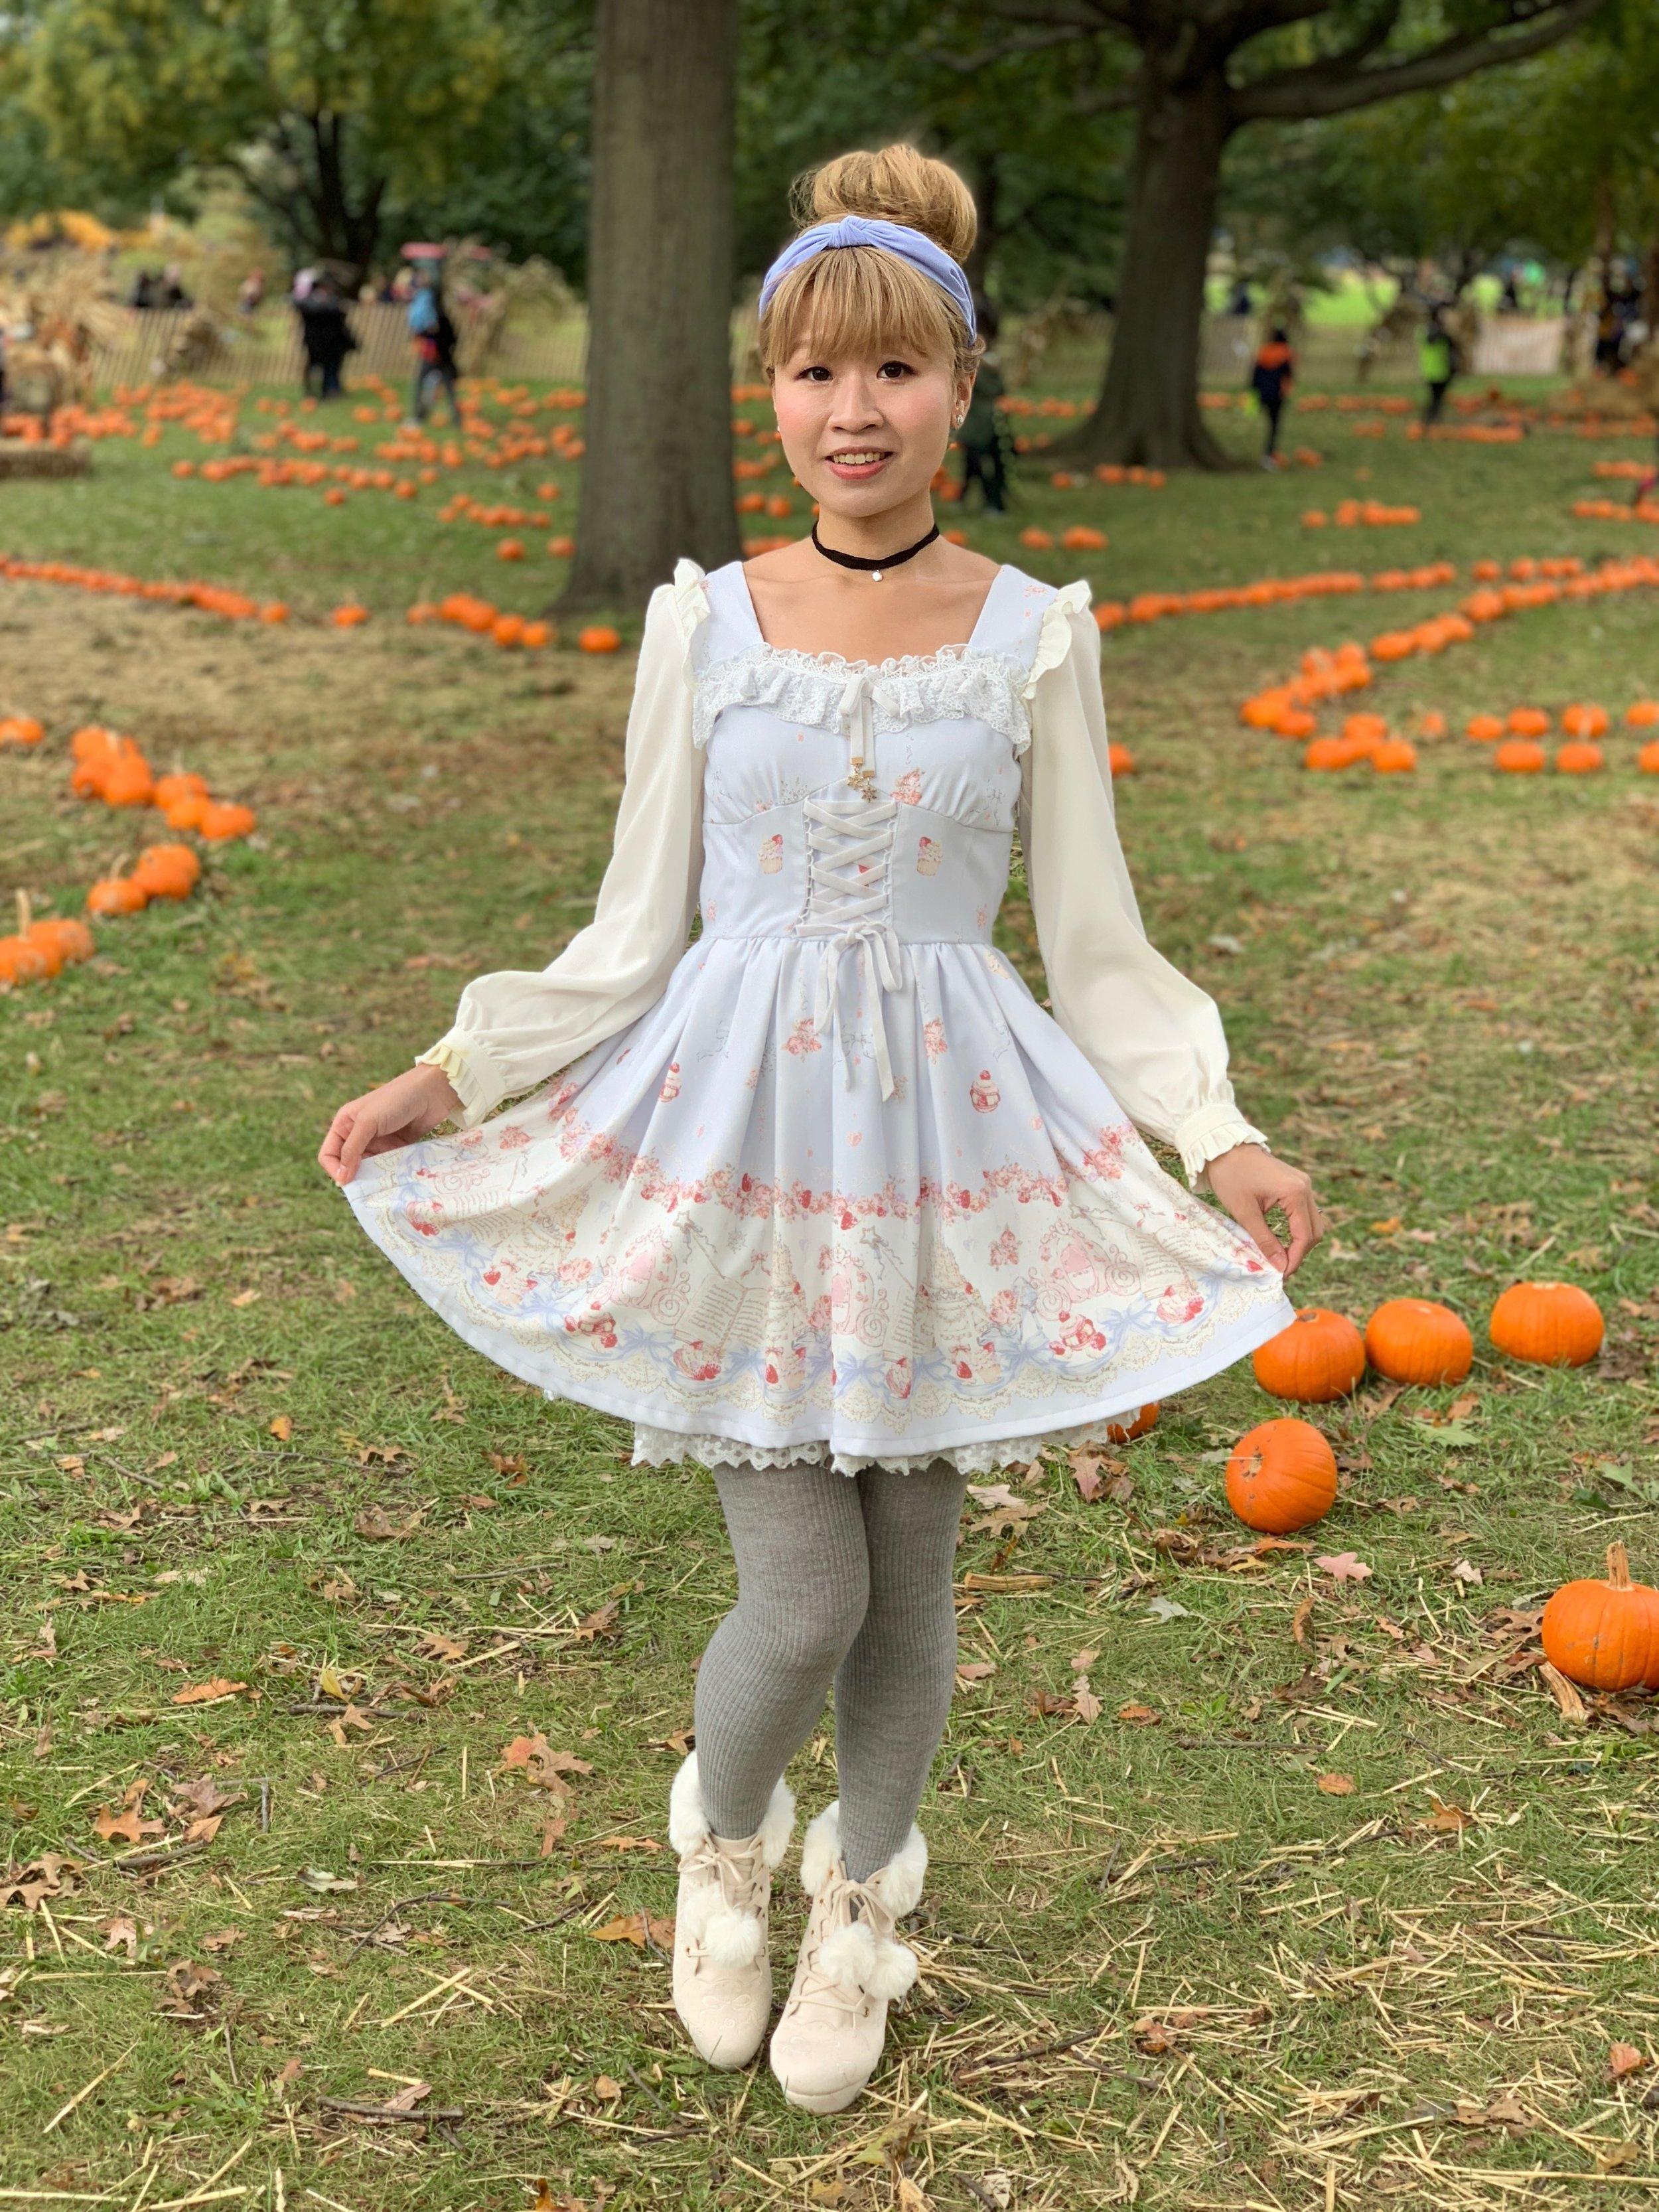 Dress: LIZ LISA; shoes: LIZ LISA; tights: Uniqlo; headband: Anthropologie; choker: Redeye.